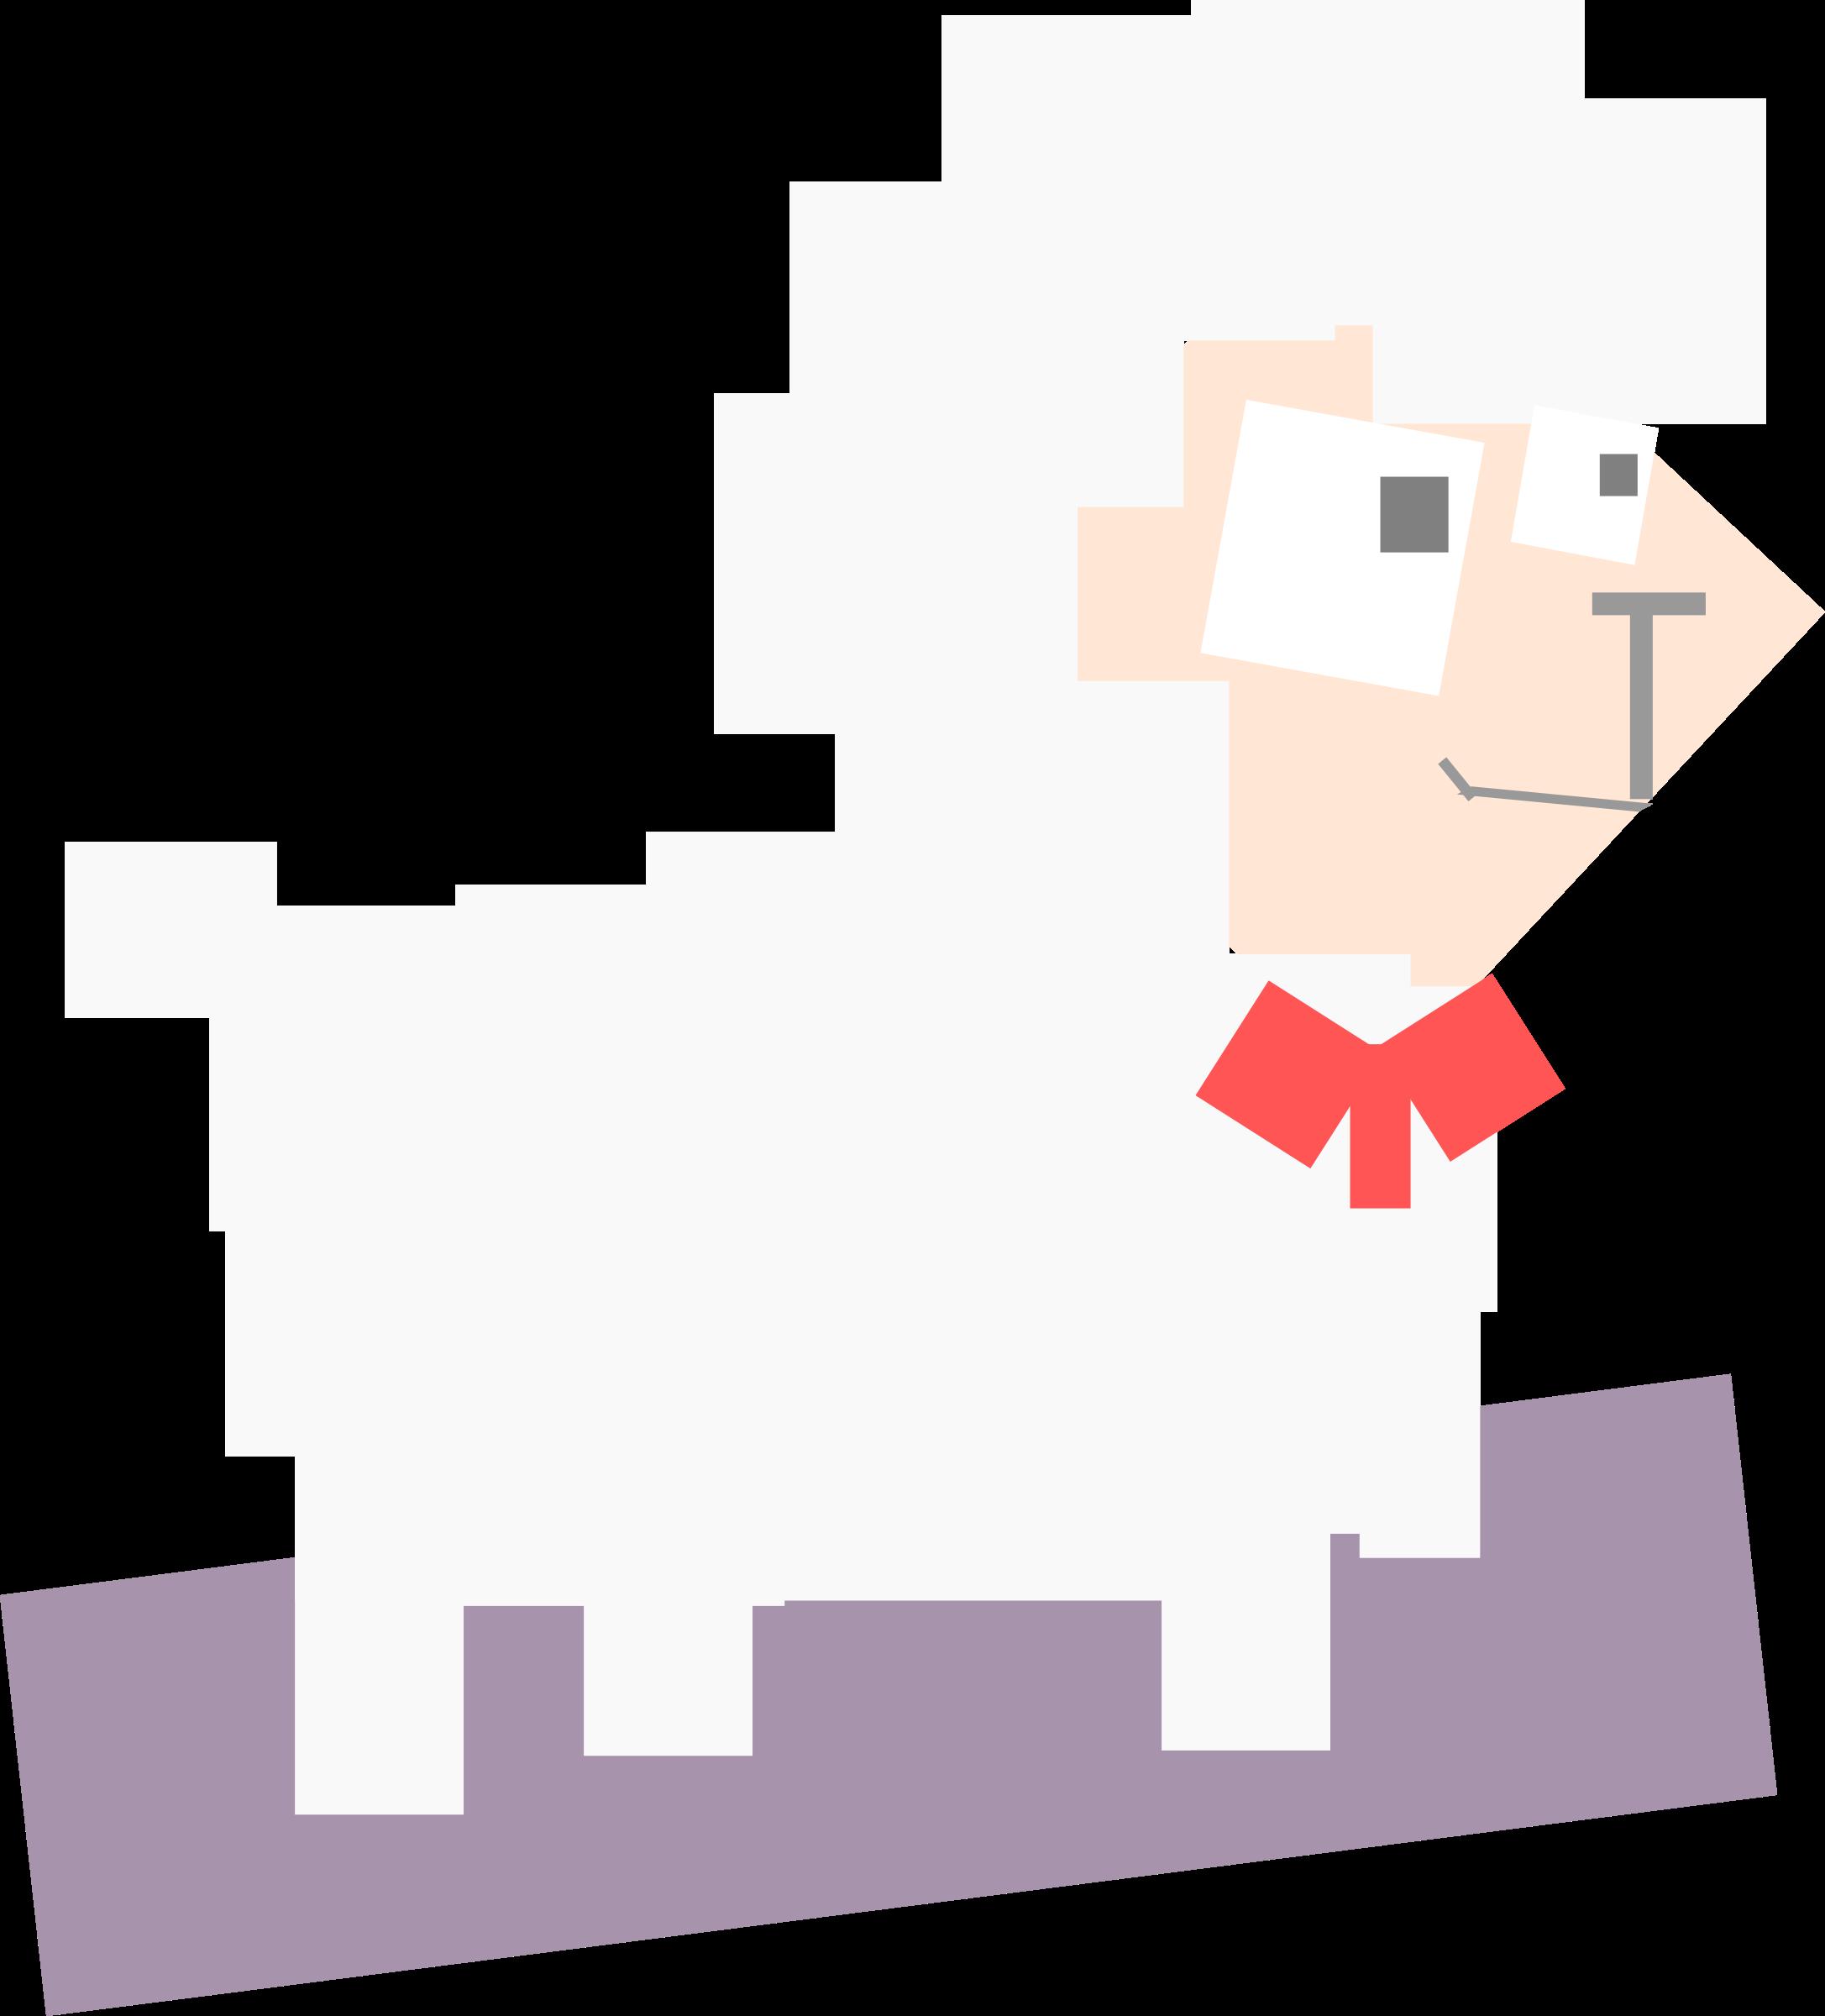 Animal sheep big image. Square clipart cartoon